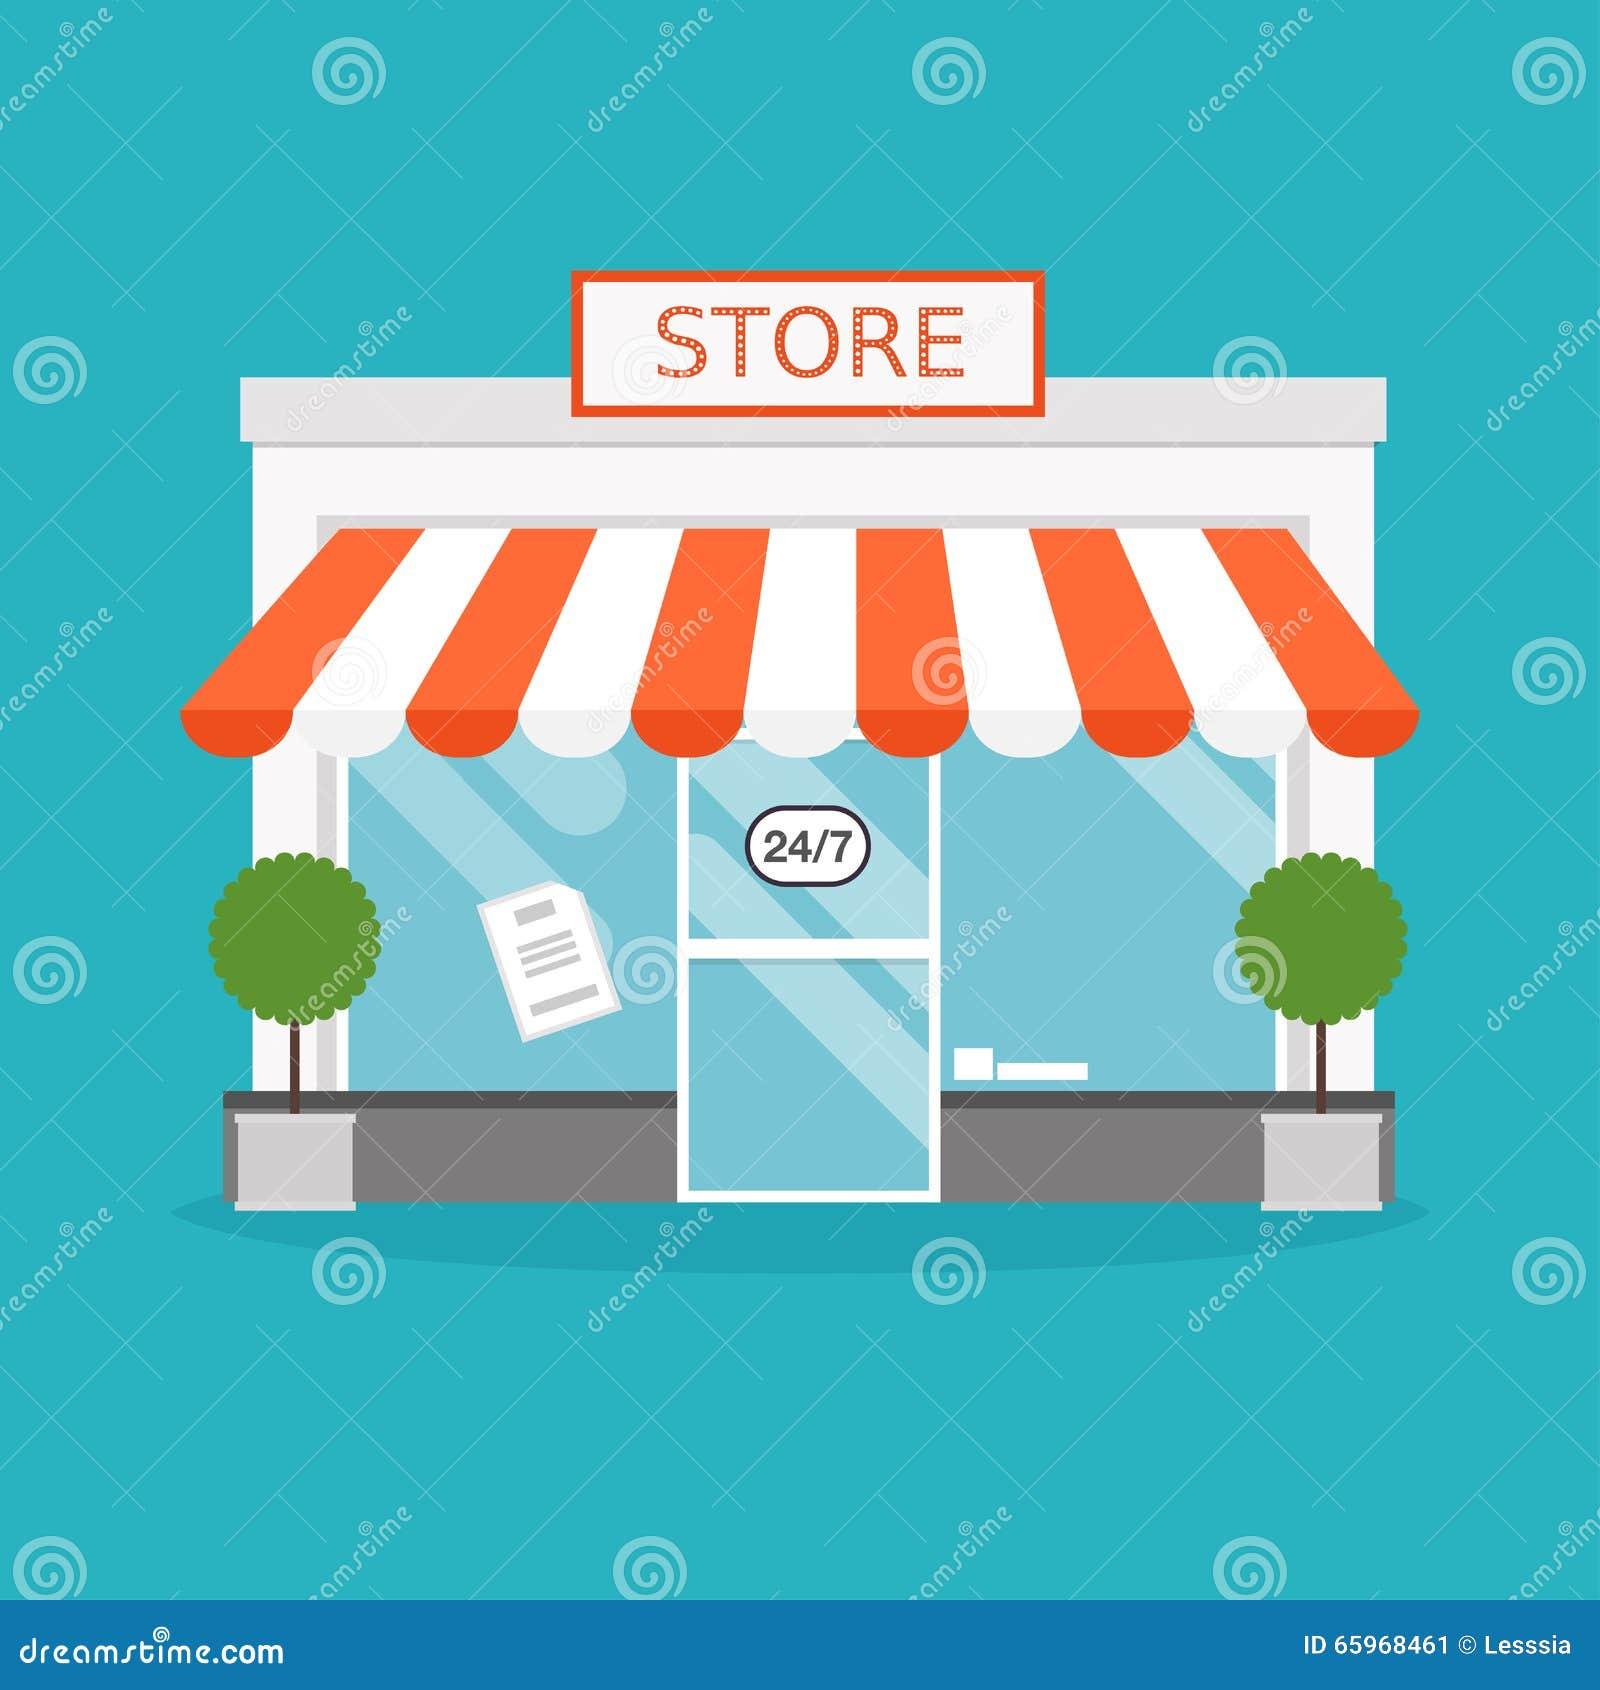 Vector Illustration Web Designs: Store Facade. Vector Illustration Of Store Building. Stock